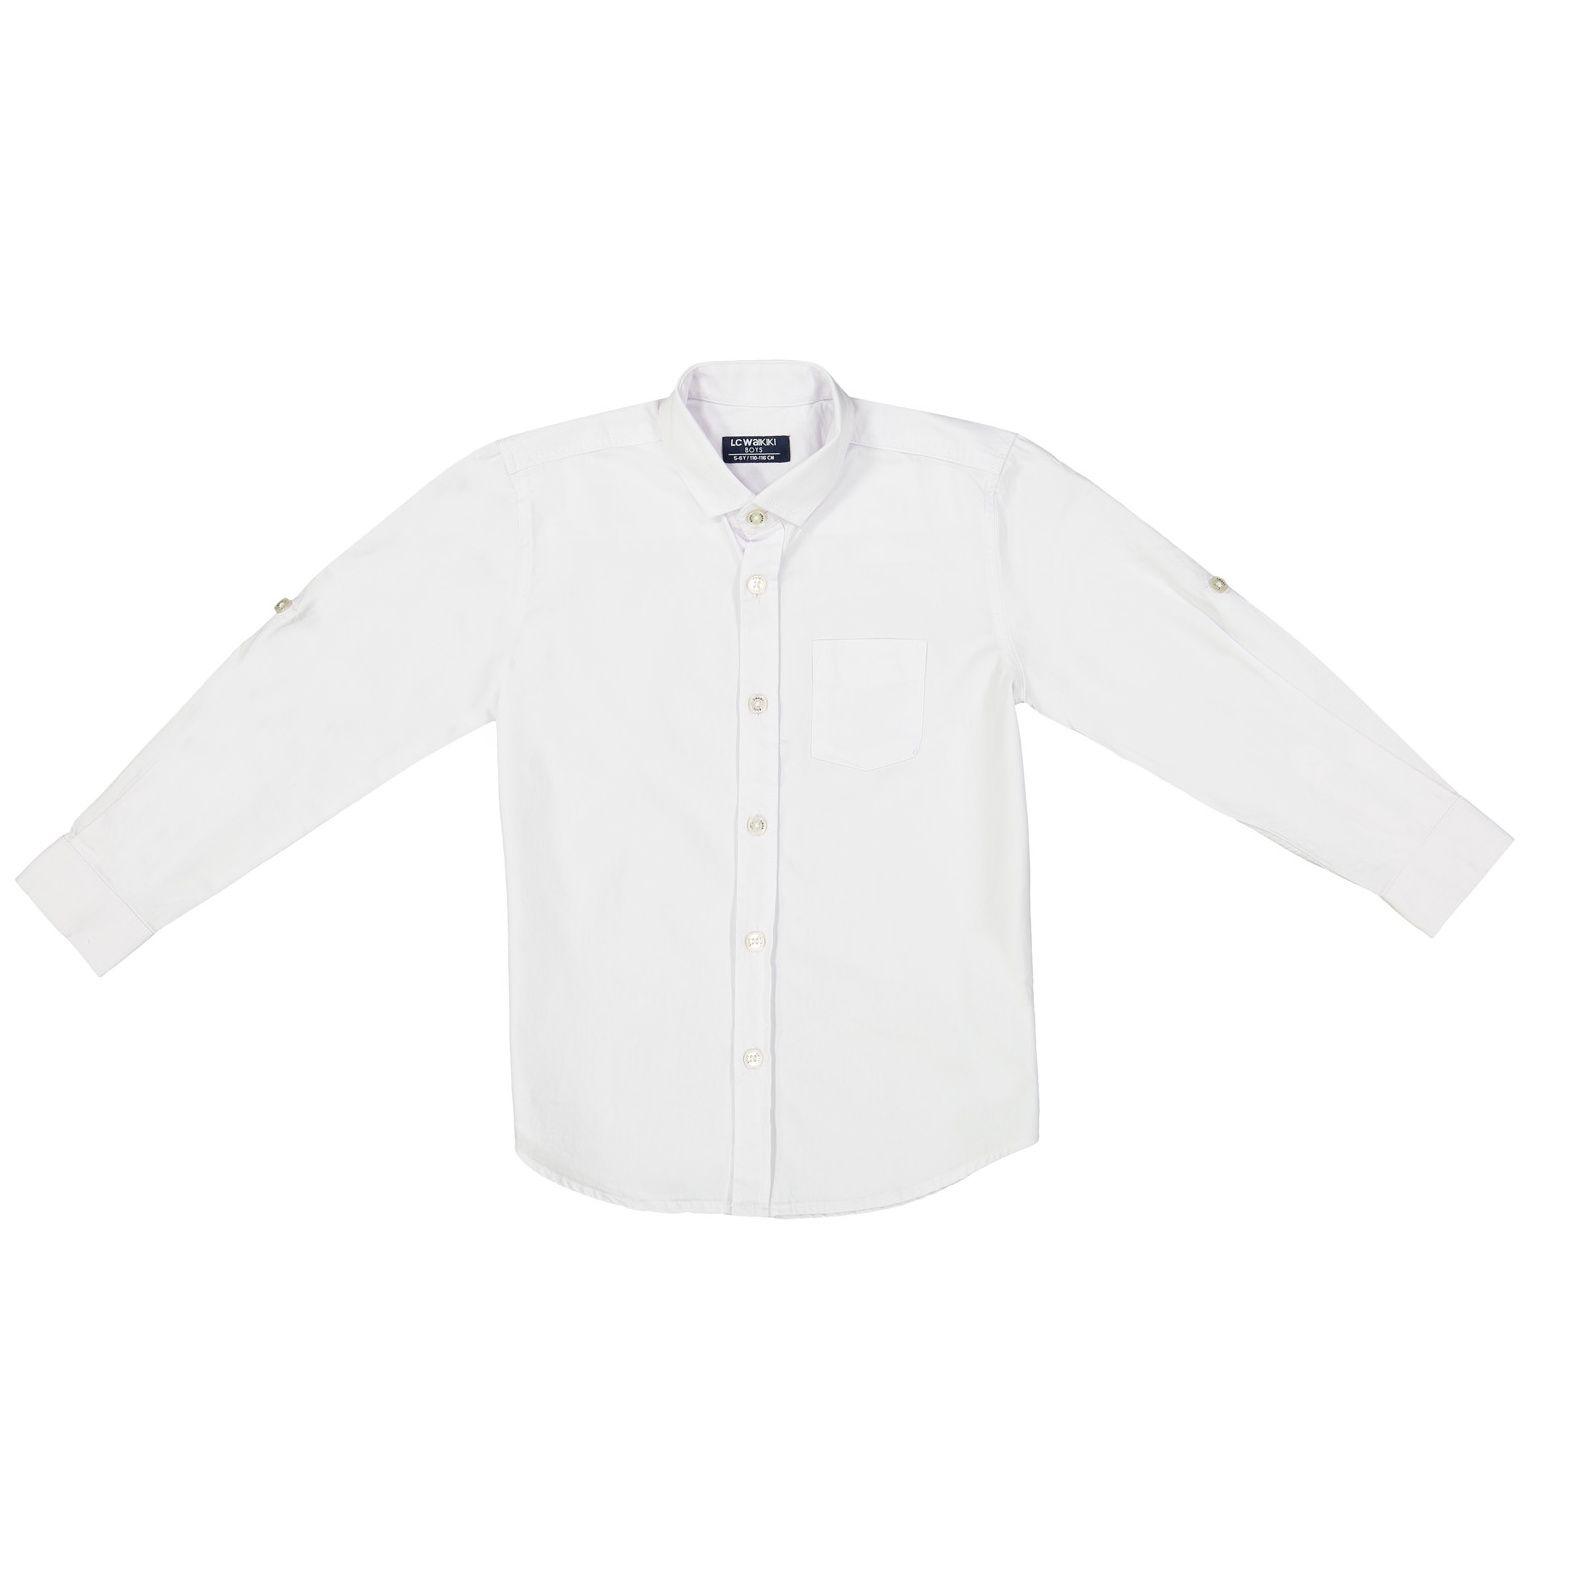 پیراهن پسرانه ال سی وایکیکی مدل 9SN358D4-JYX main 1 1